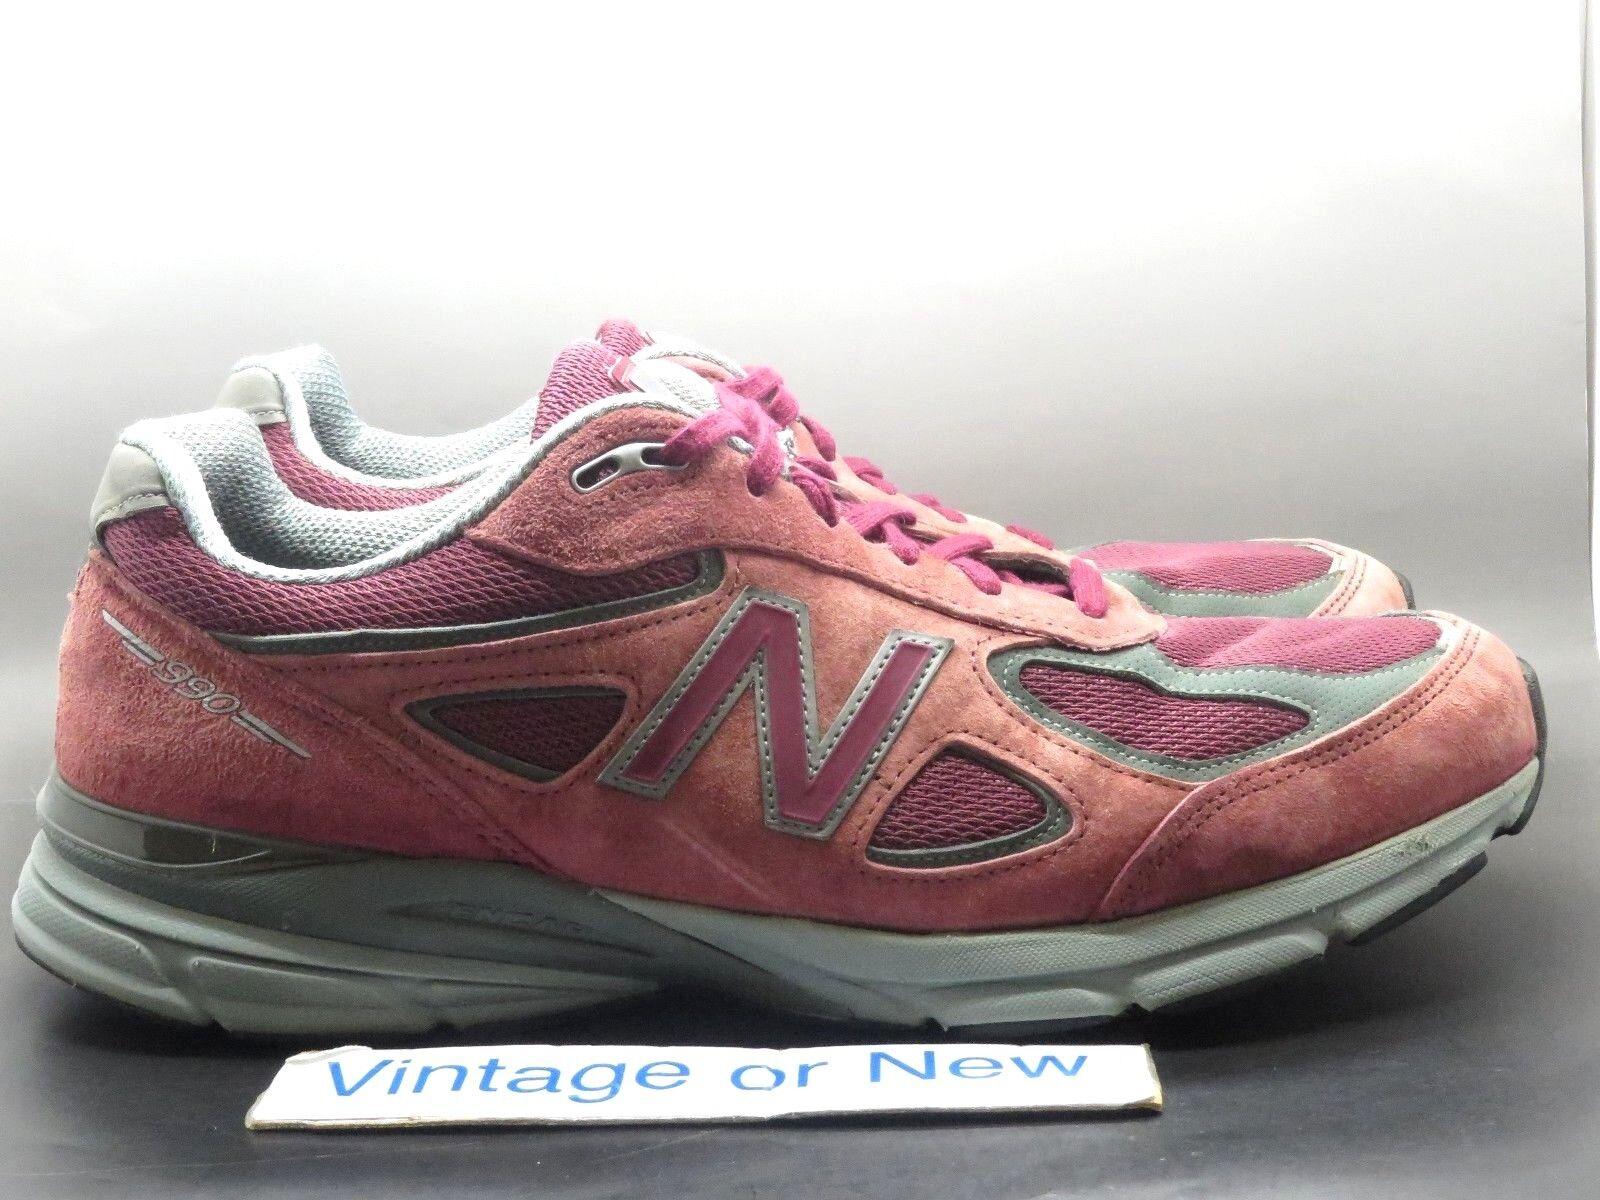 Men's New Balance 990v4 Burgundy M990BU4 Running shoes sz 14